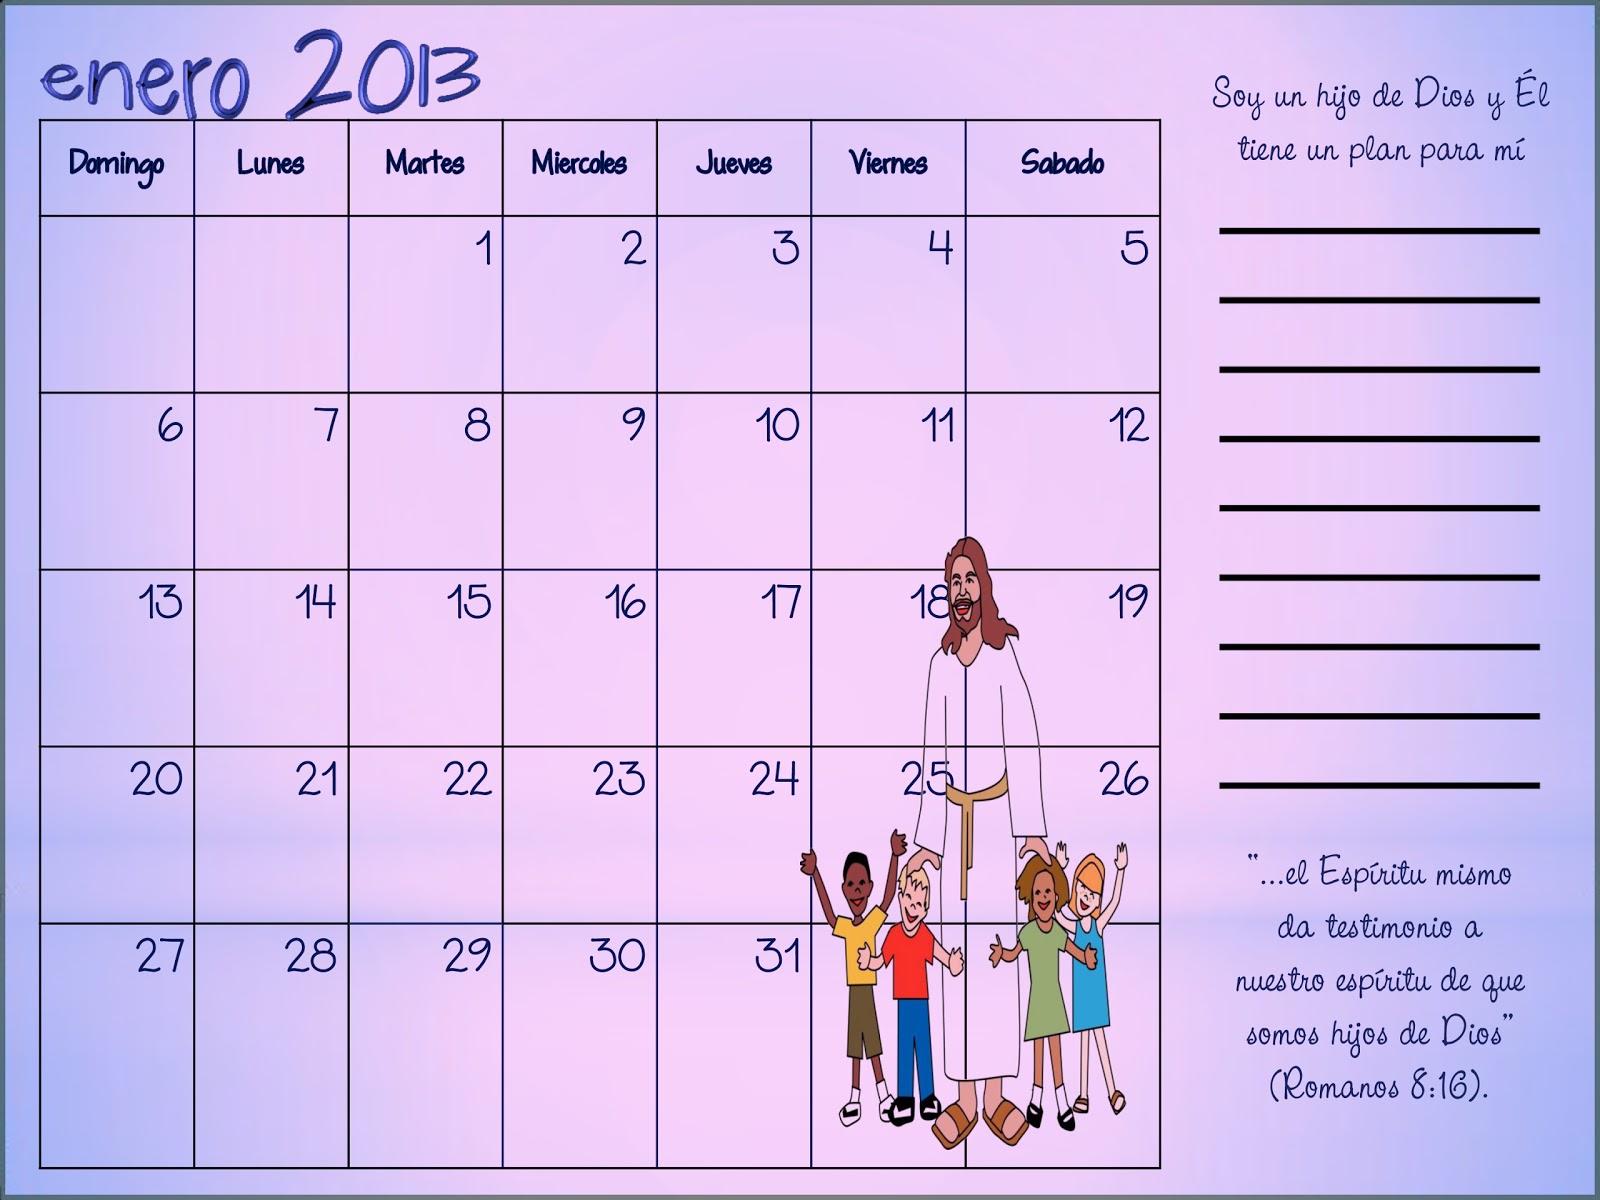 holamormon3: 2012